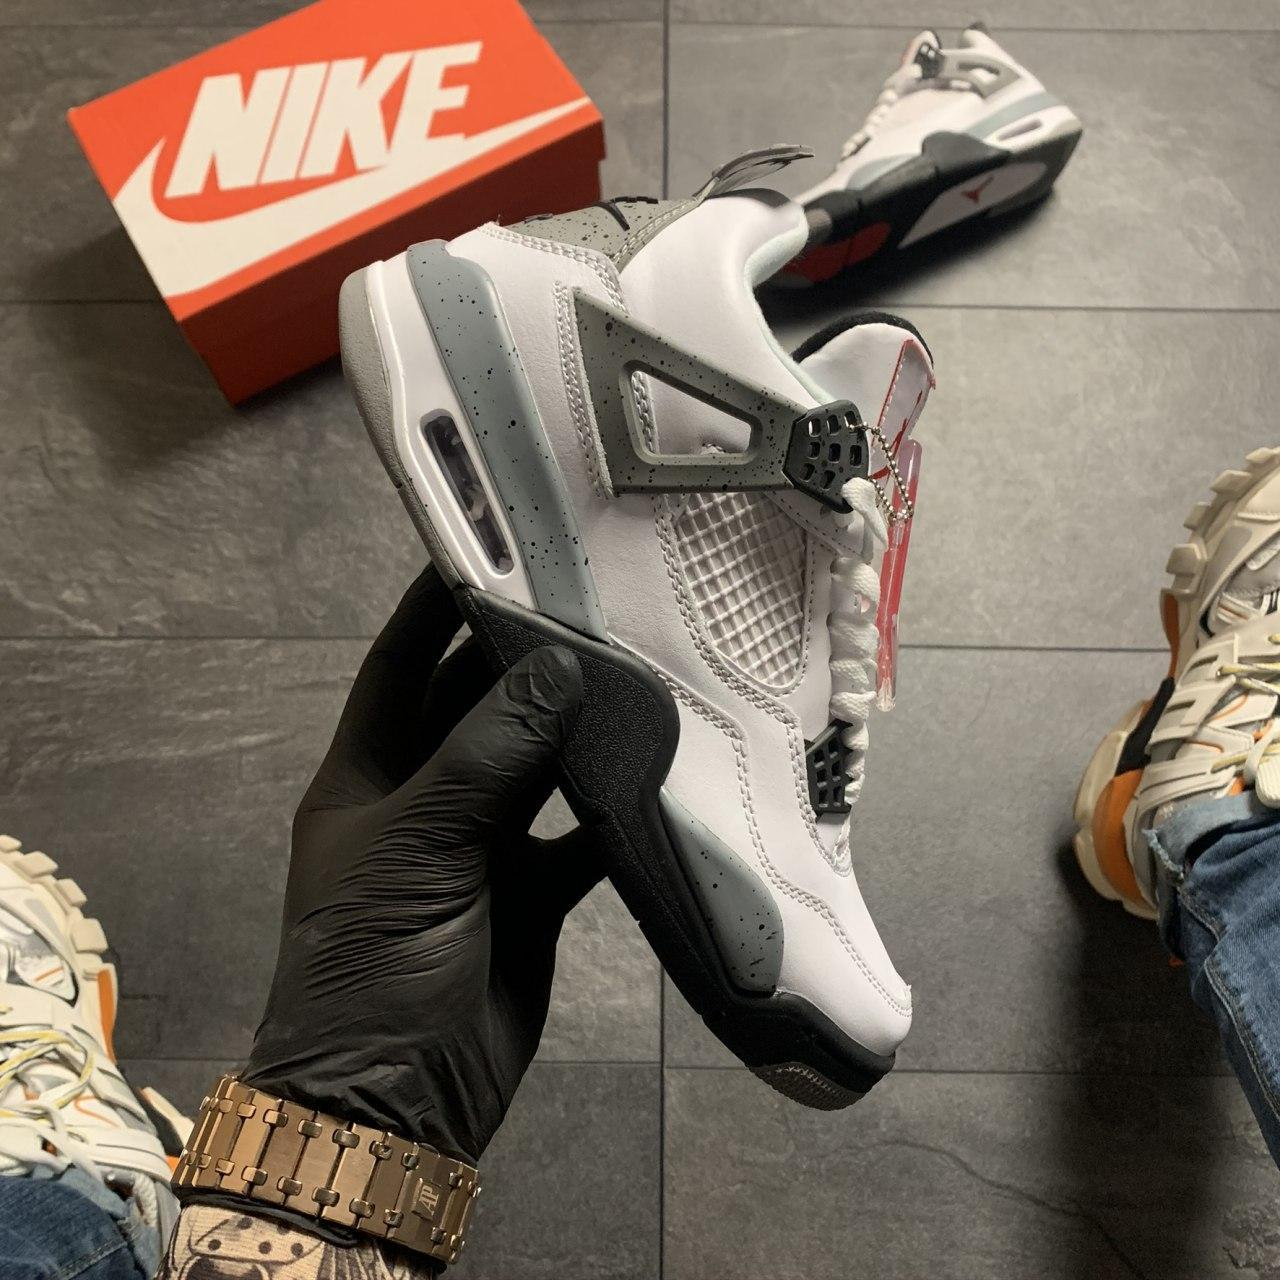 Мужские кроссовки Nike Air Jordan 4 Retro Grey White, Реплика